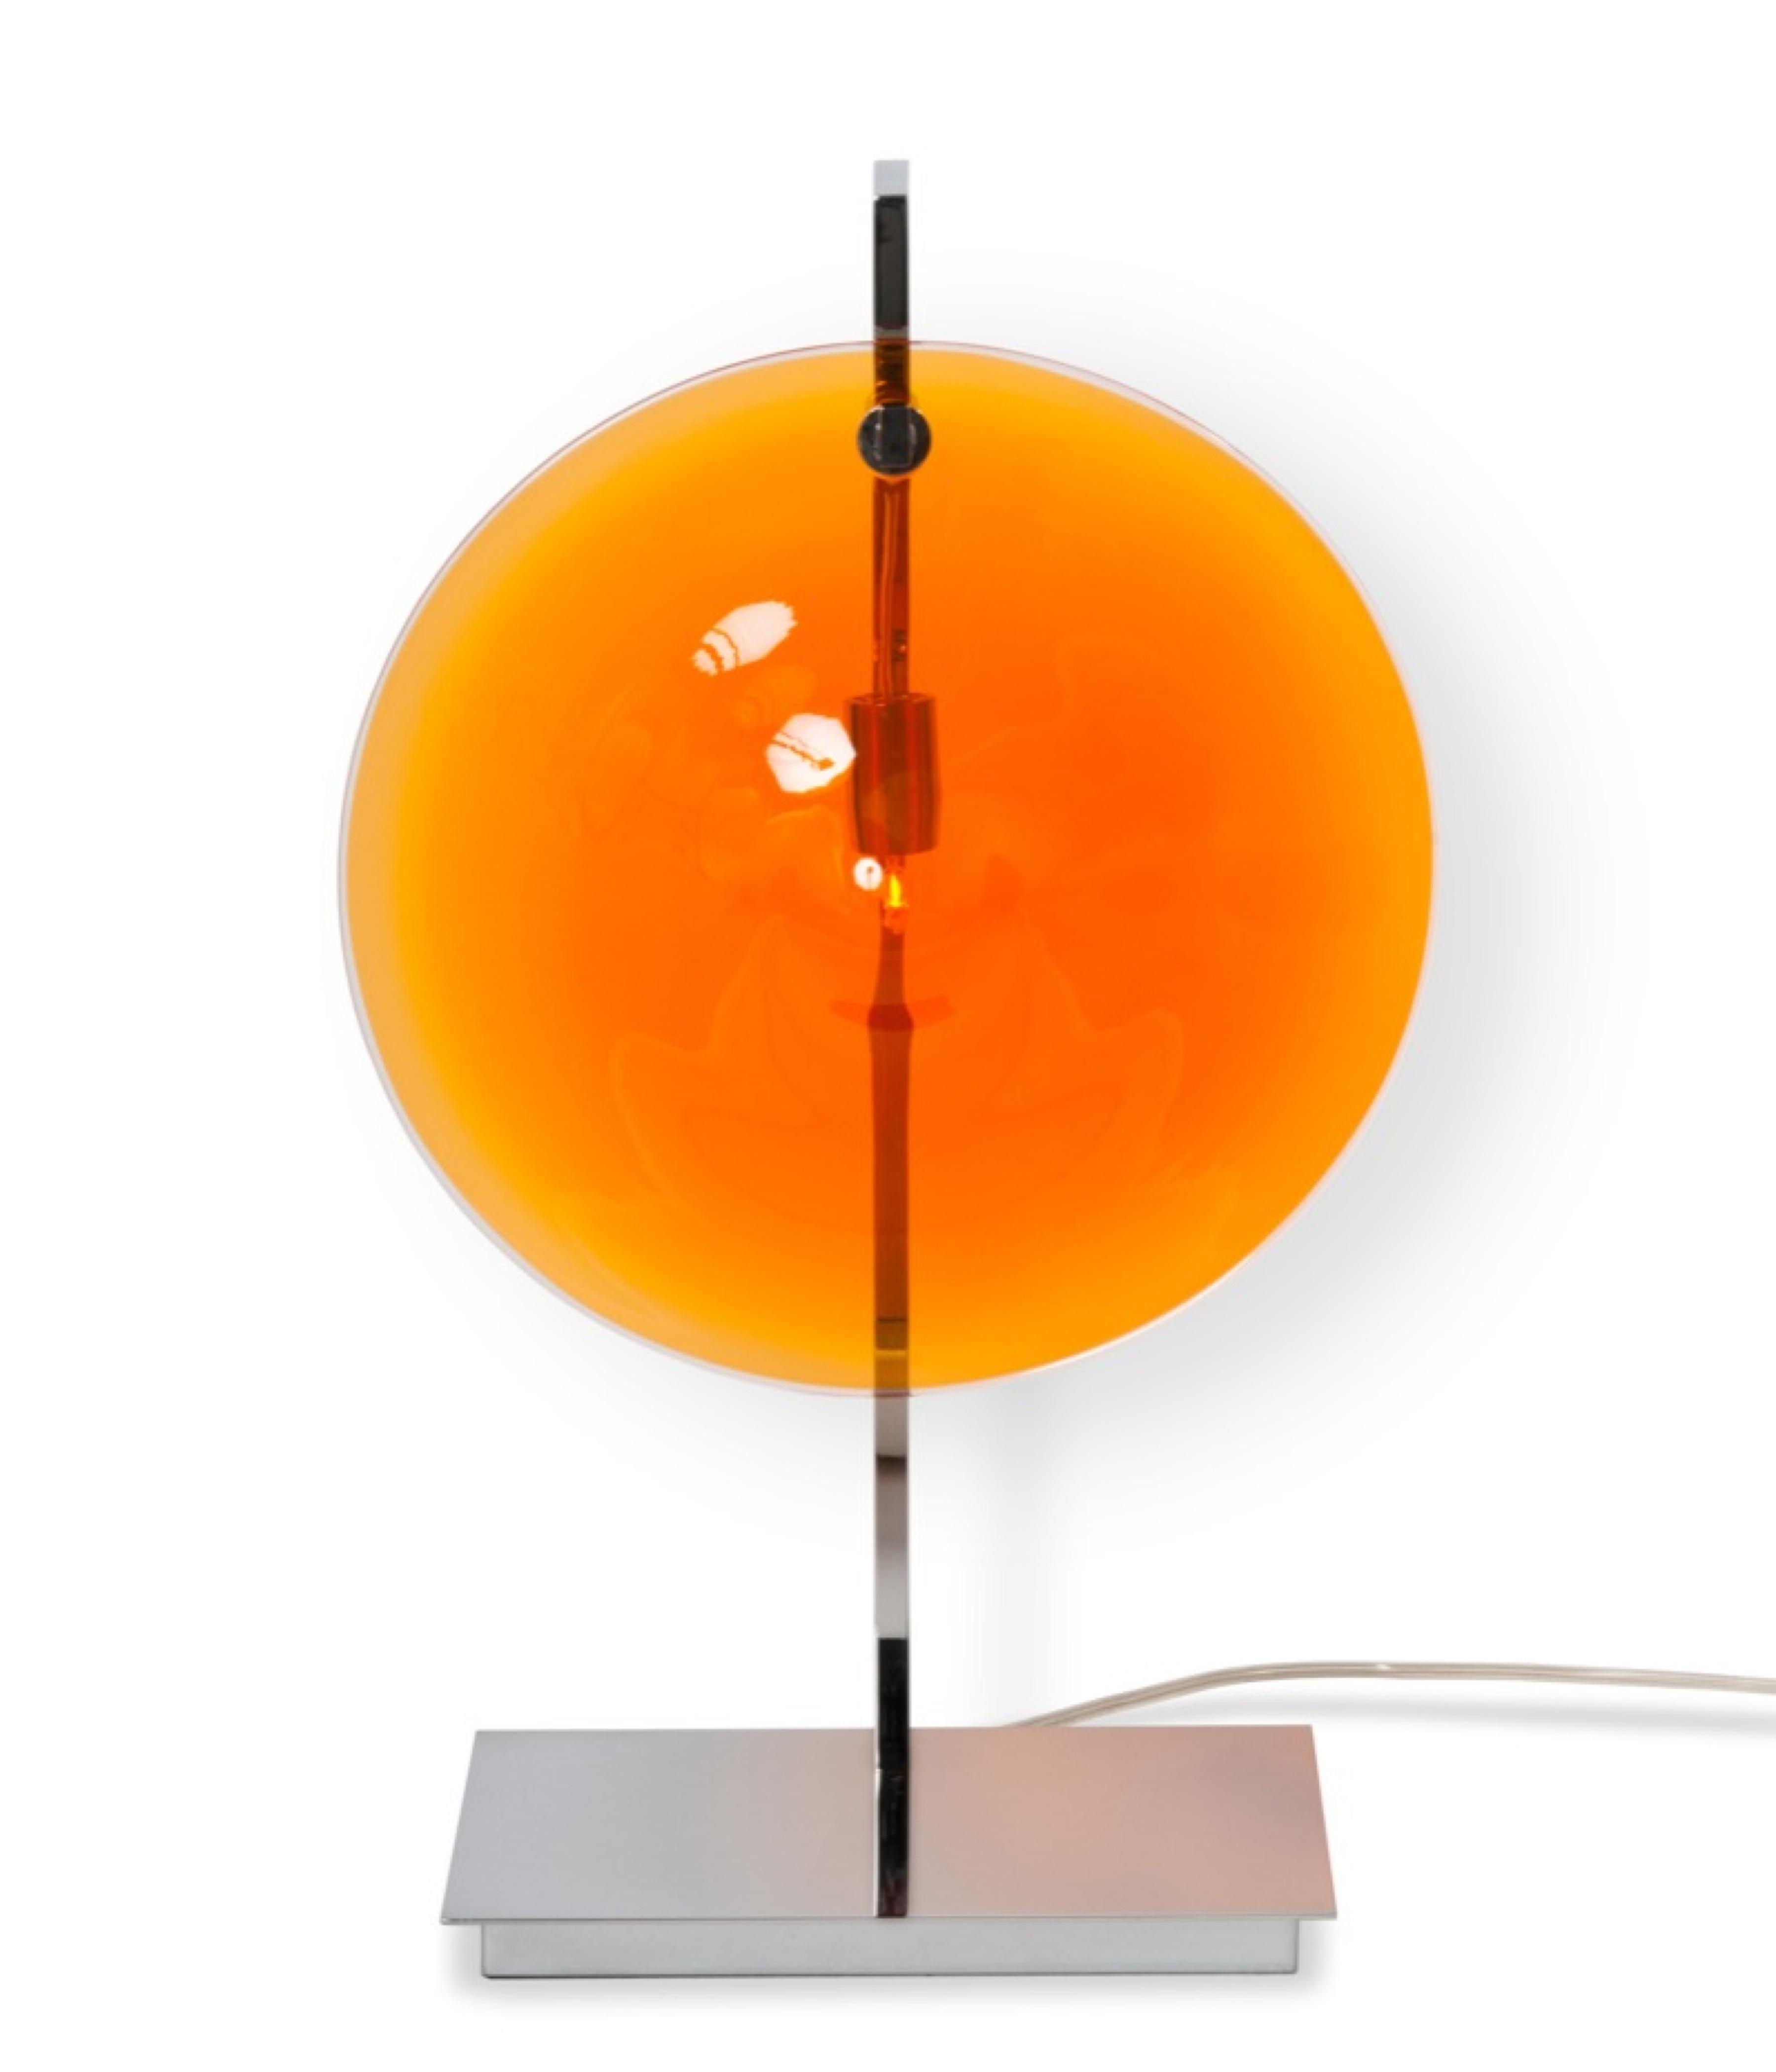 lampe de table orbe chrome orange patrick e naggar. Black Bedroom Furniture Sets. Home Design Ideas